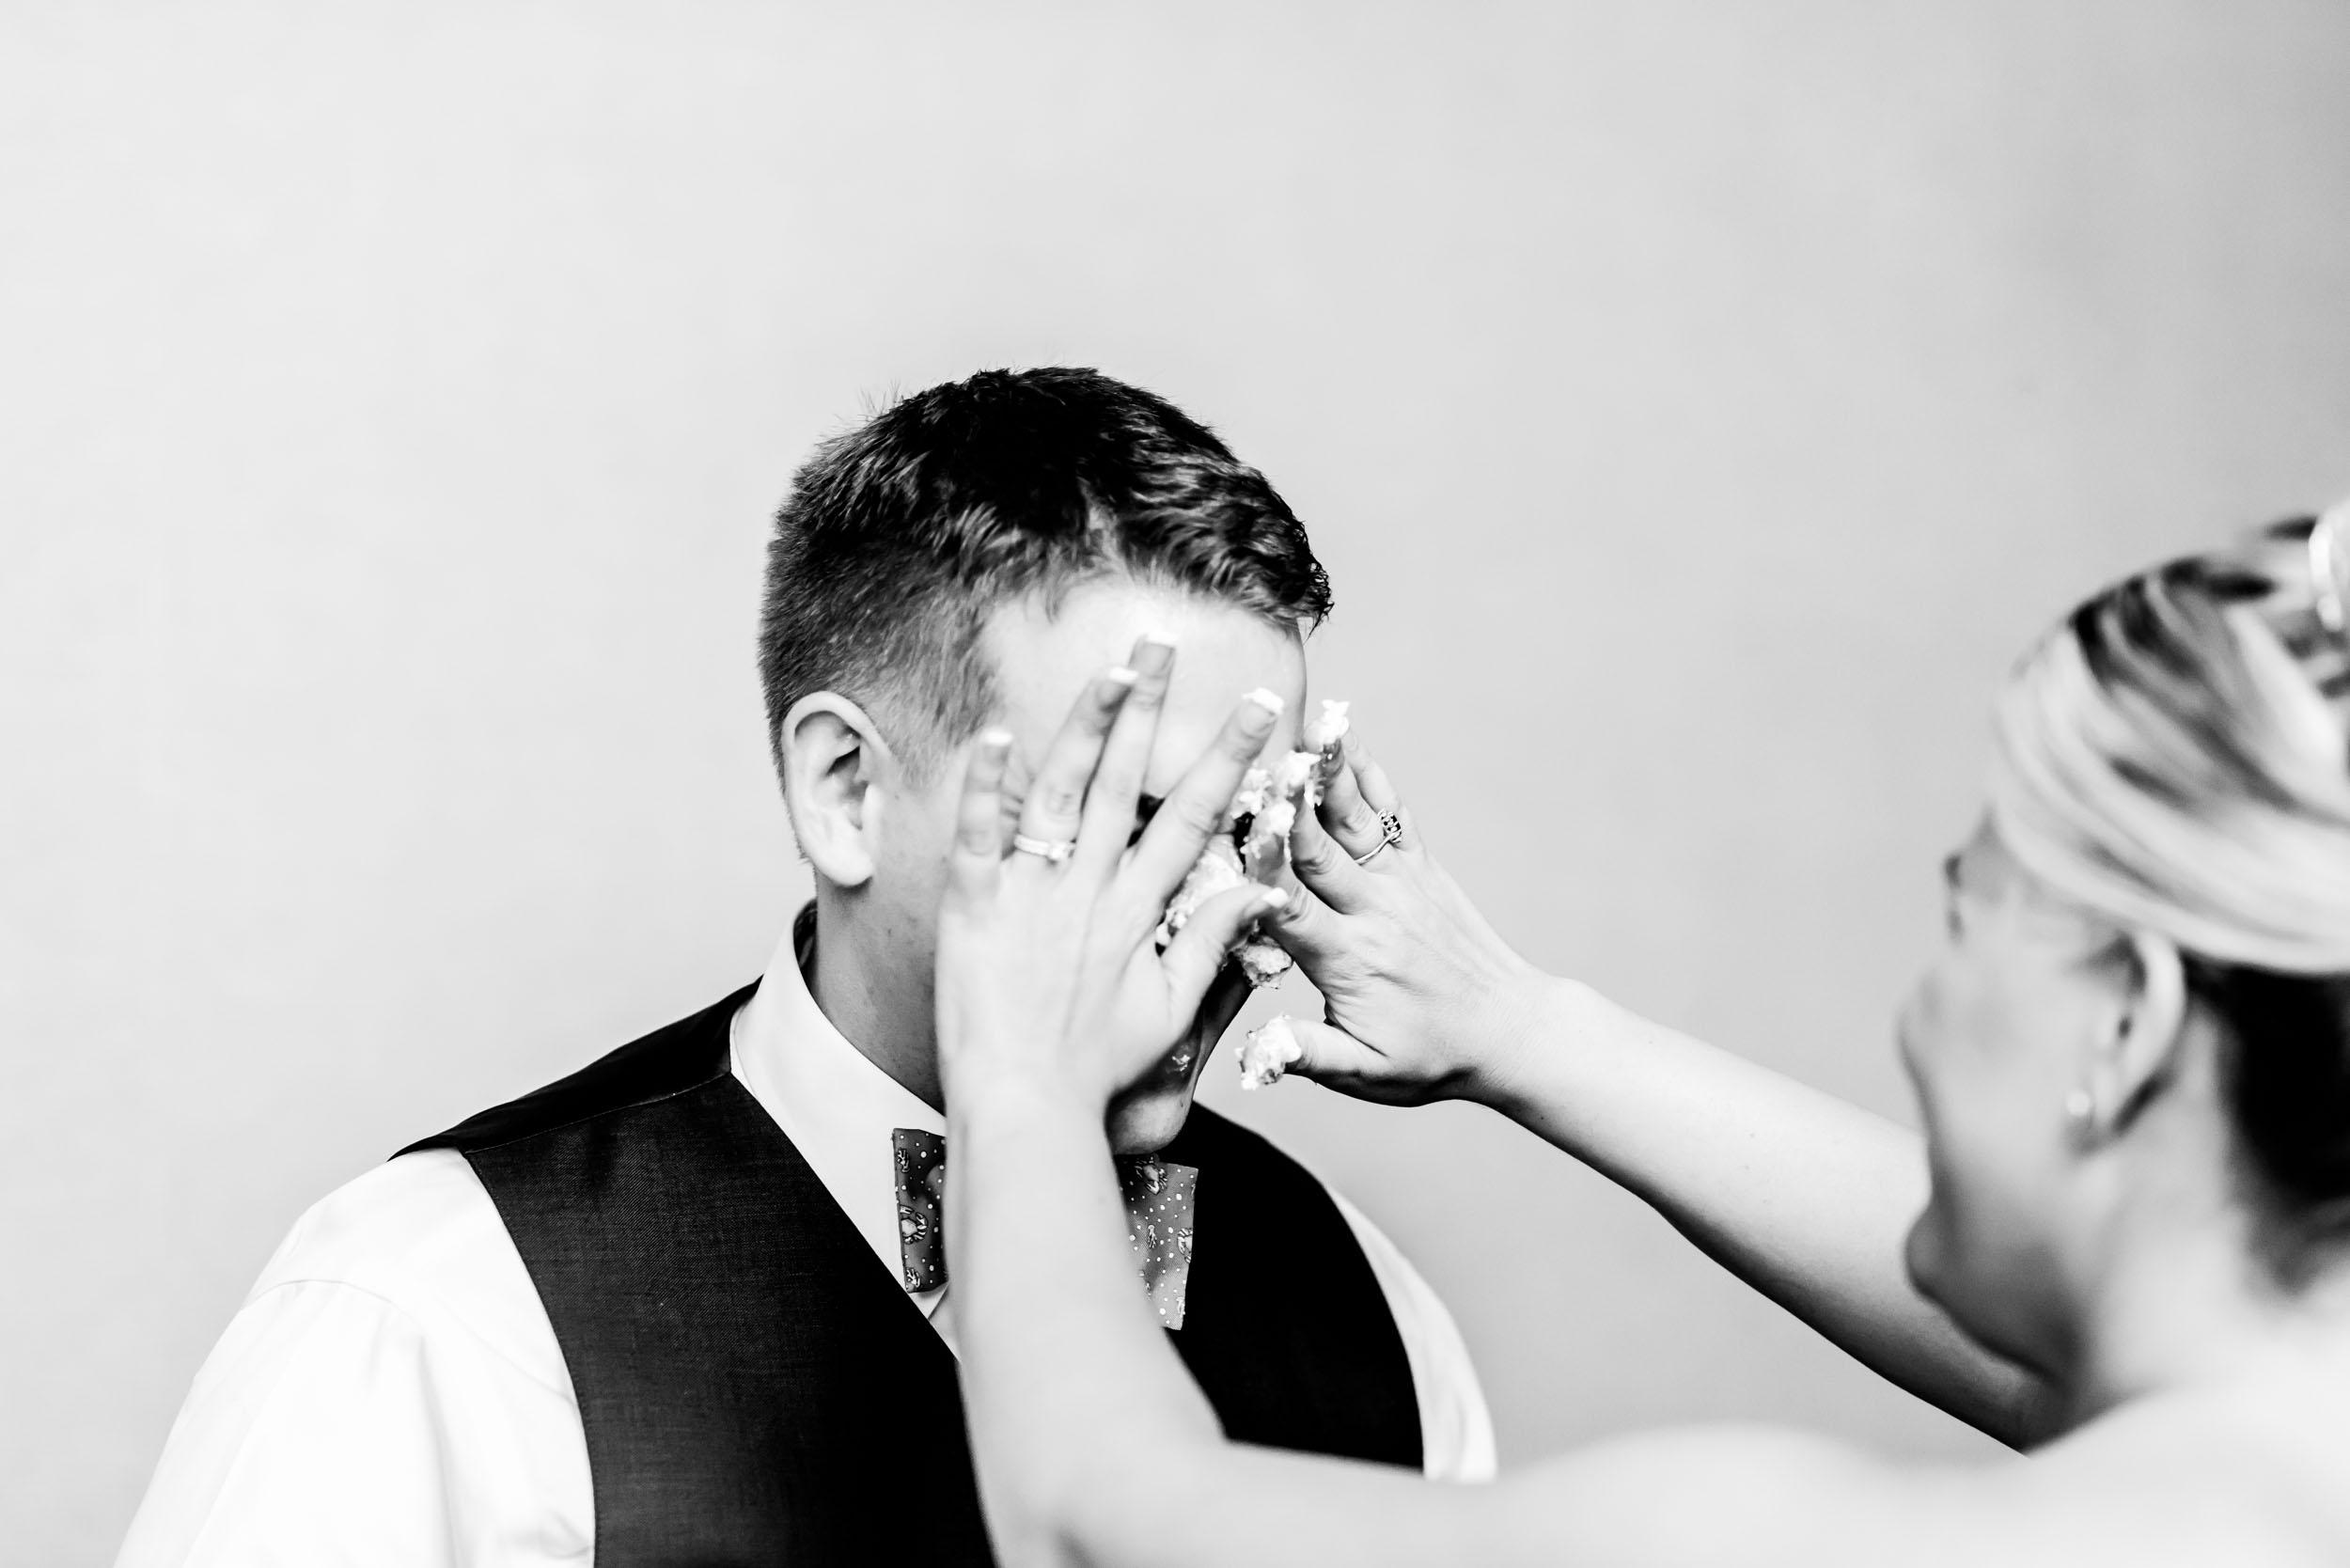 dc+metro+wedding+photographer+vadym+guliuk+photography+wedding+cake-cutting-2023.jpg